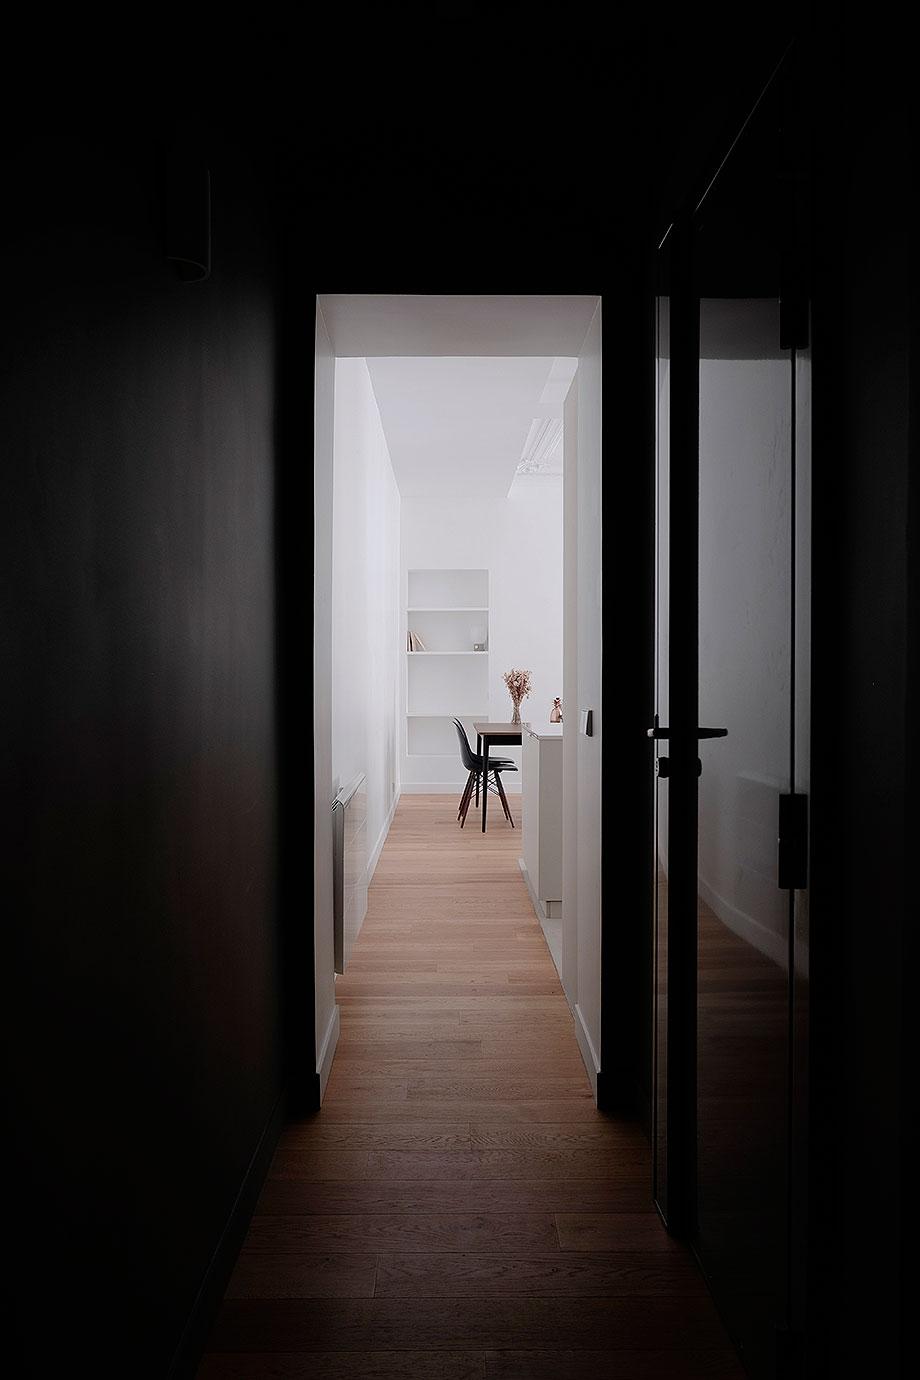 reforma integral de un apartamento en paris por anthropie architecture (s) (1) - foto juliette alexandre